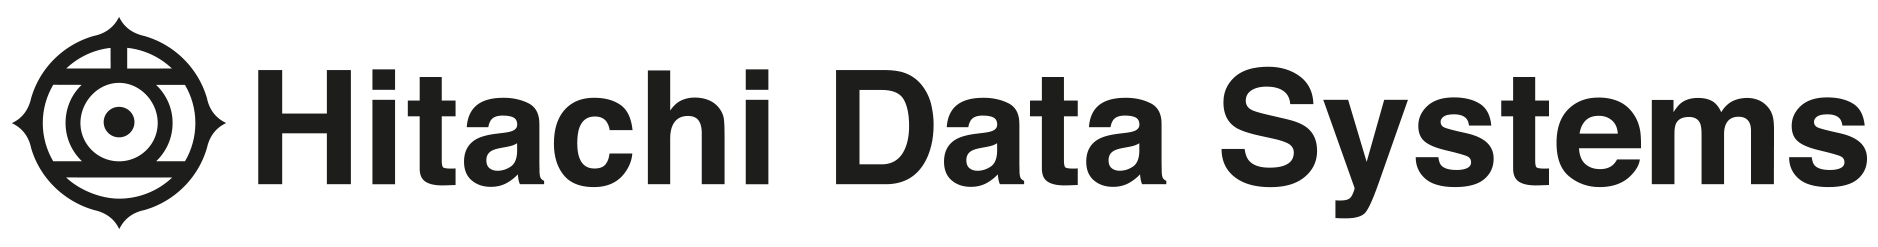 you incorrect data You